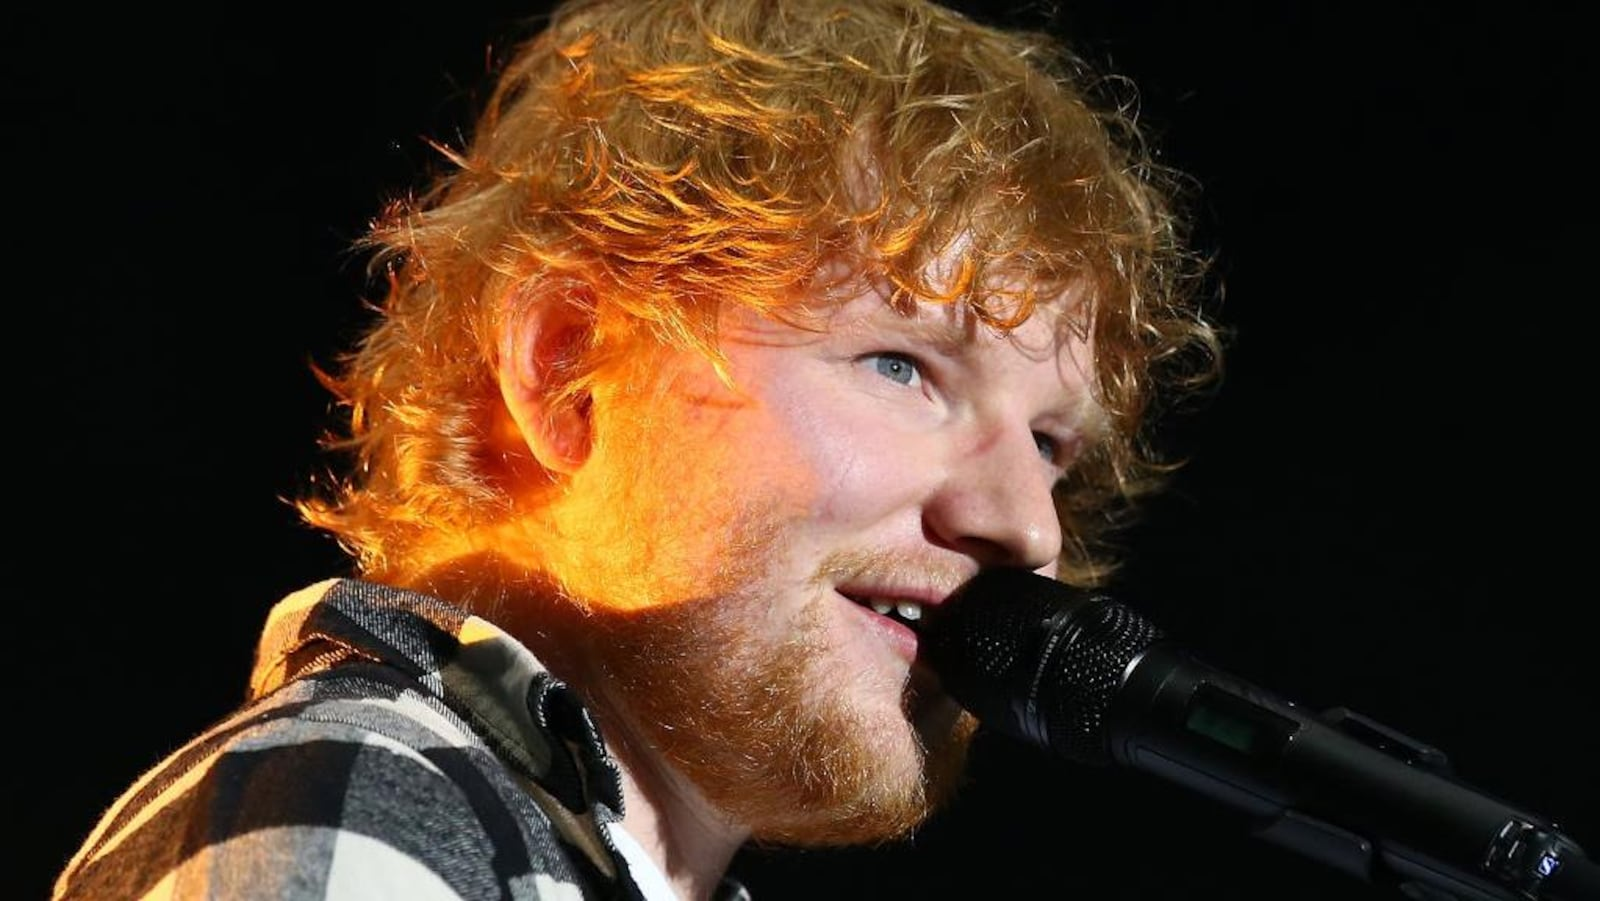 L'artiste britannique Ed Sheeran chante au micro.